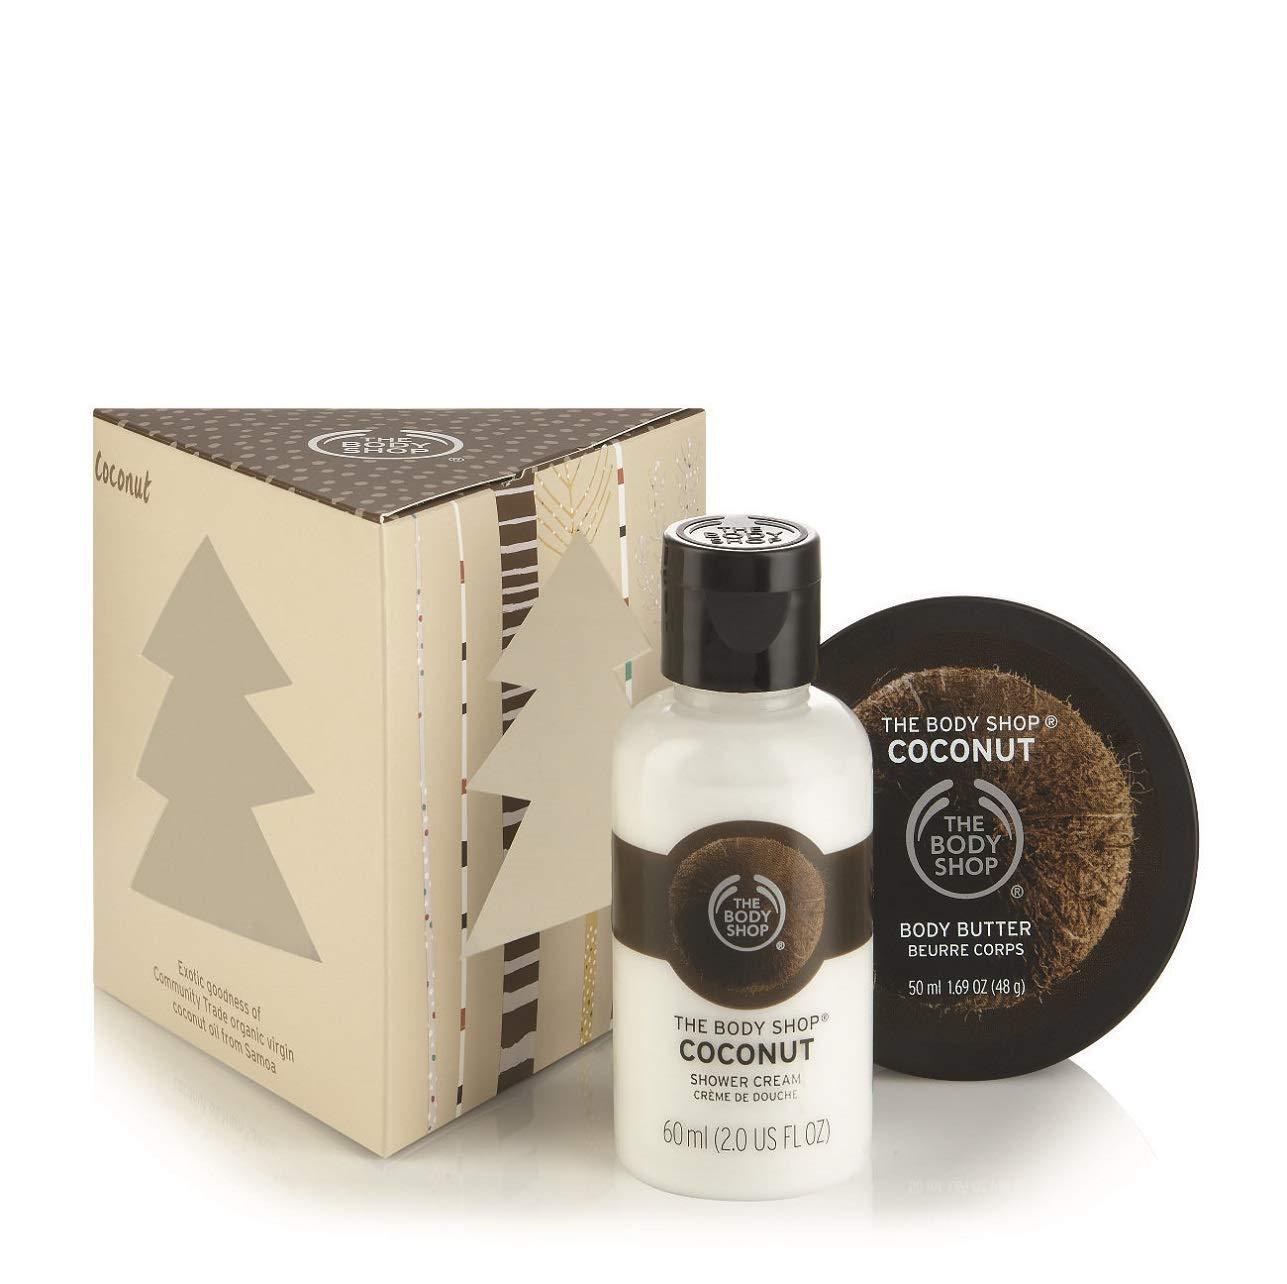 The Body Shop Coconut Treats Gift Set